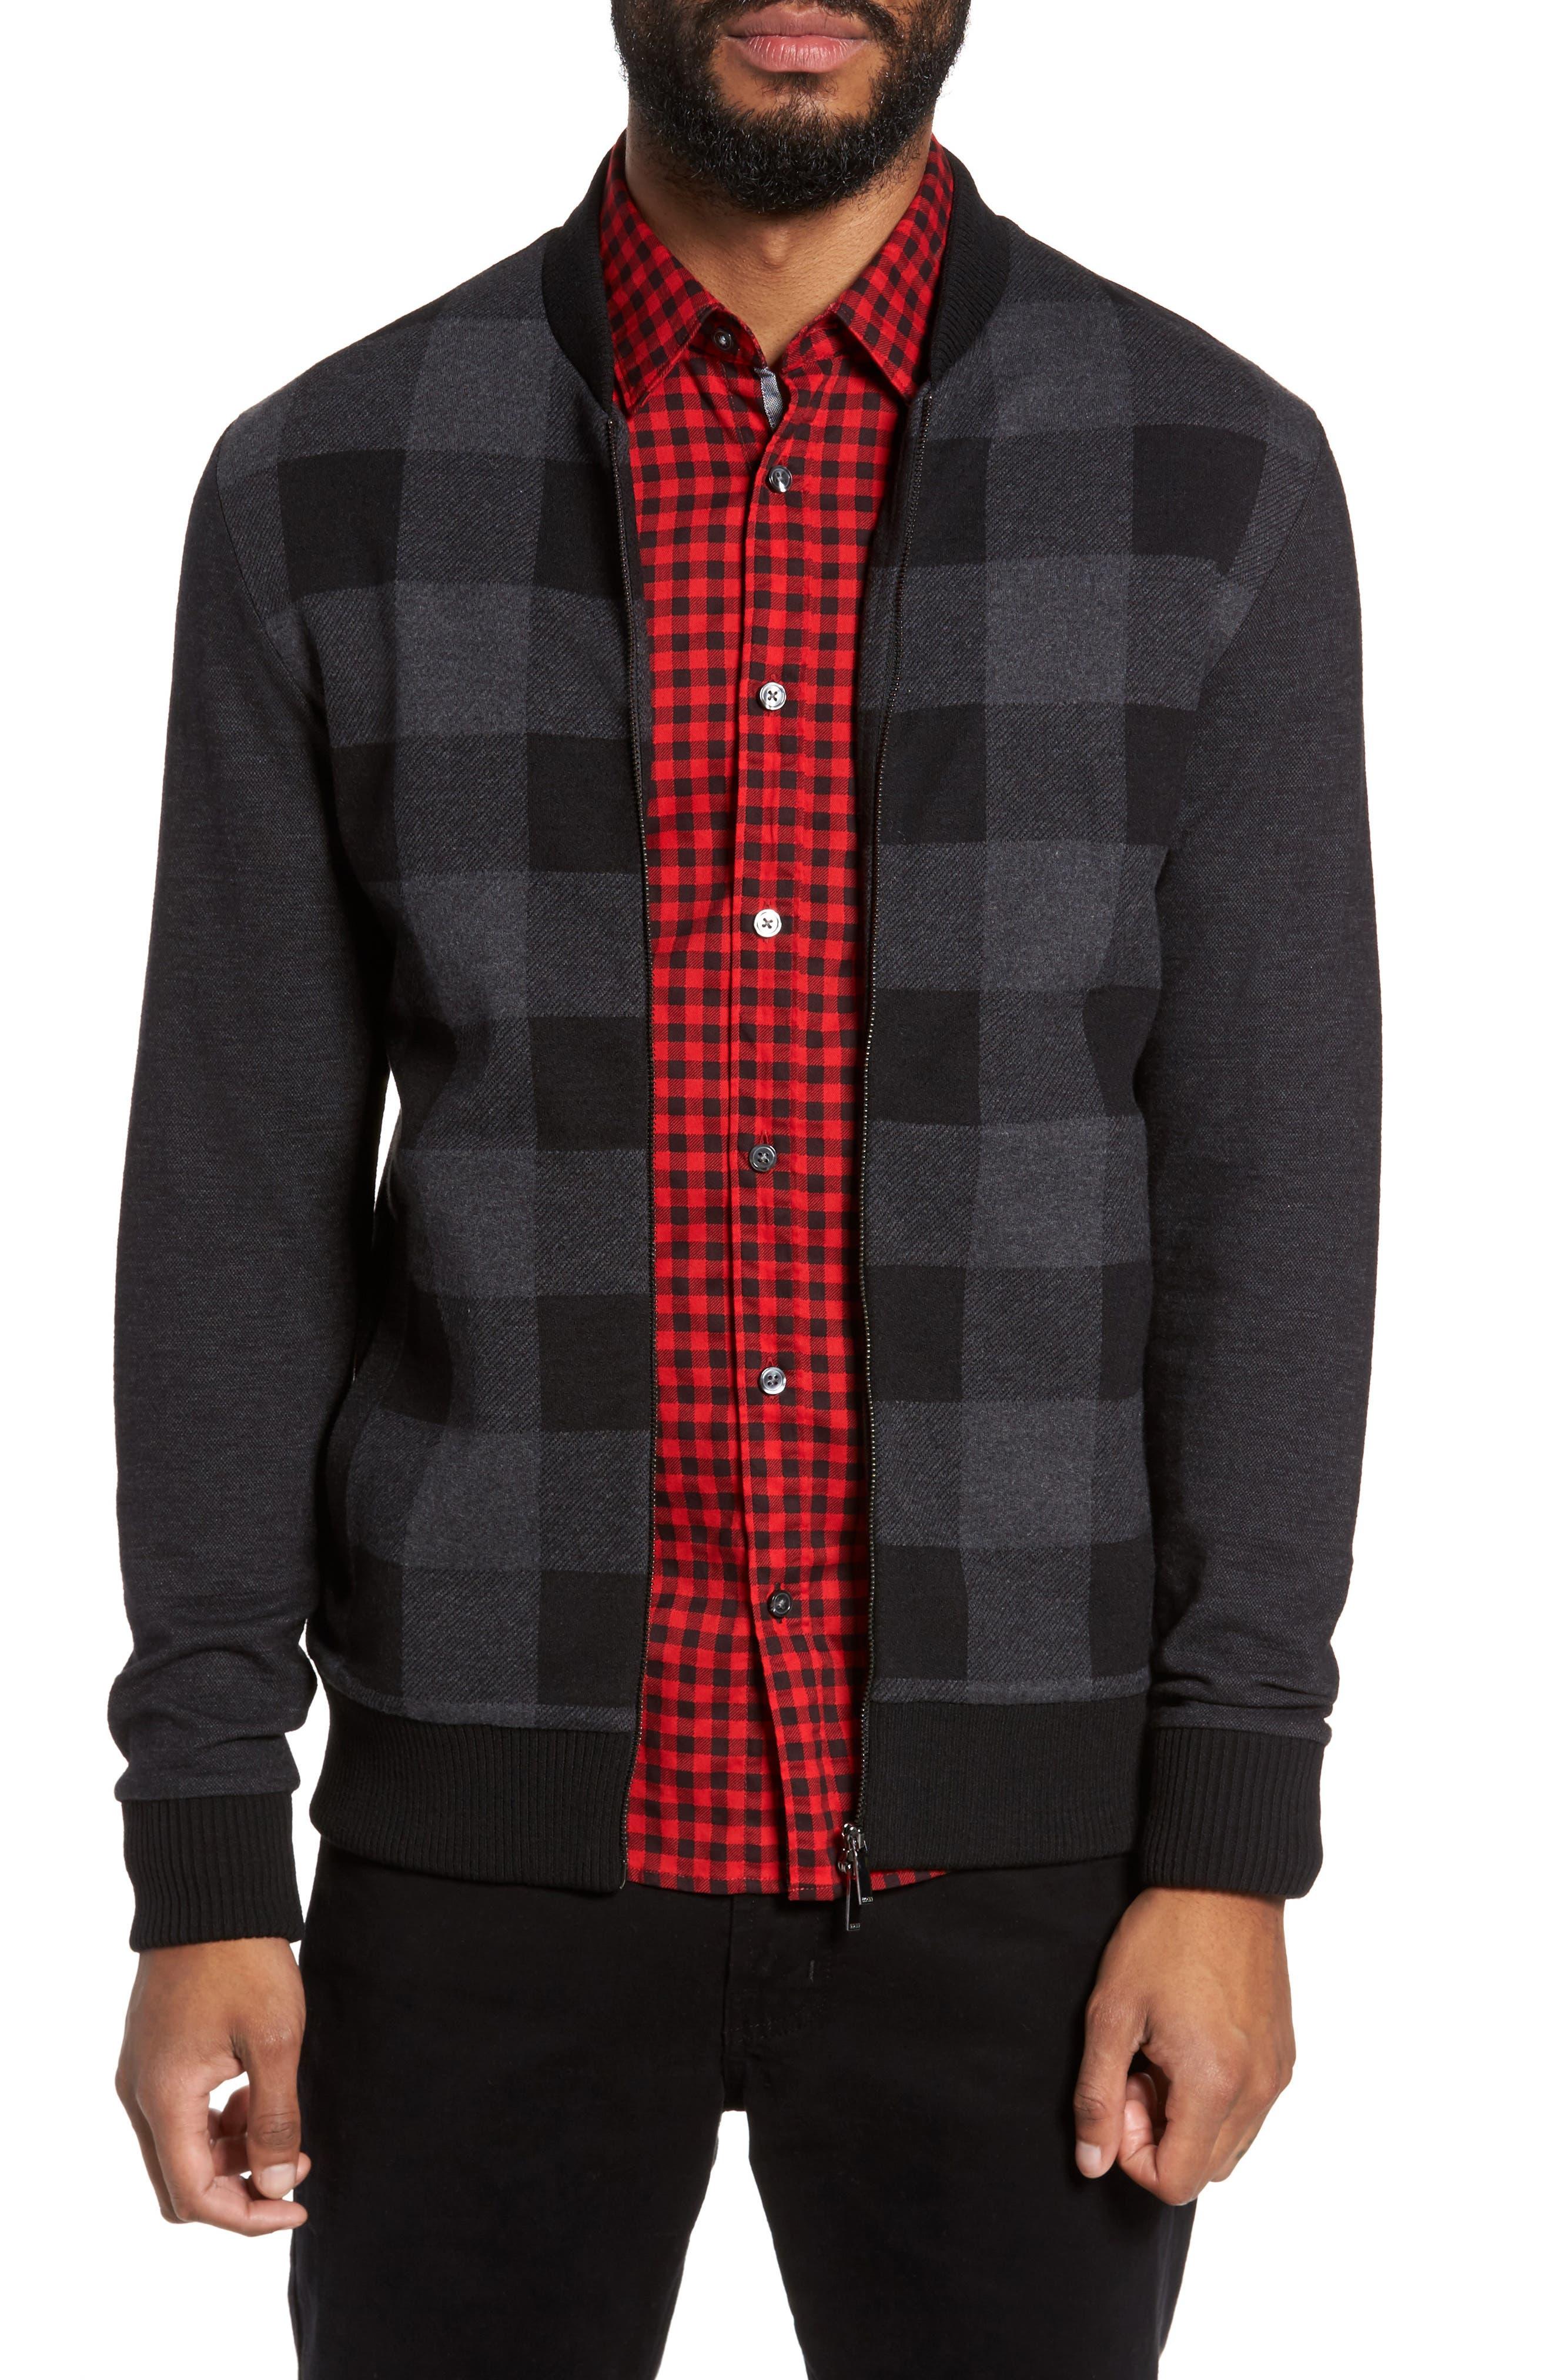 Salea Check Wool Blend Bomber Jacket,                         Main,                         color, 001